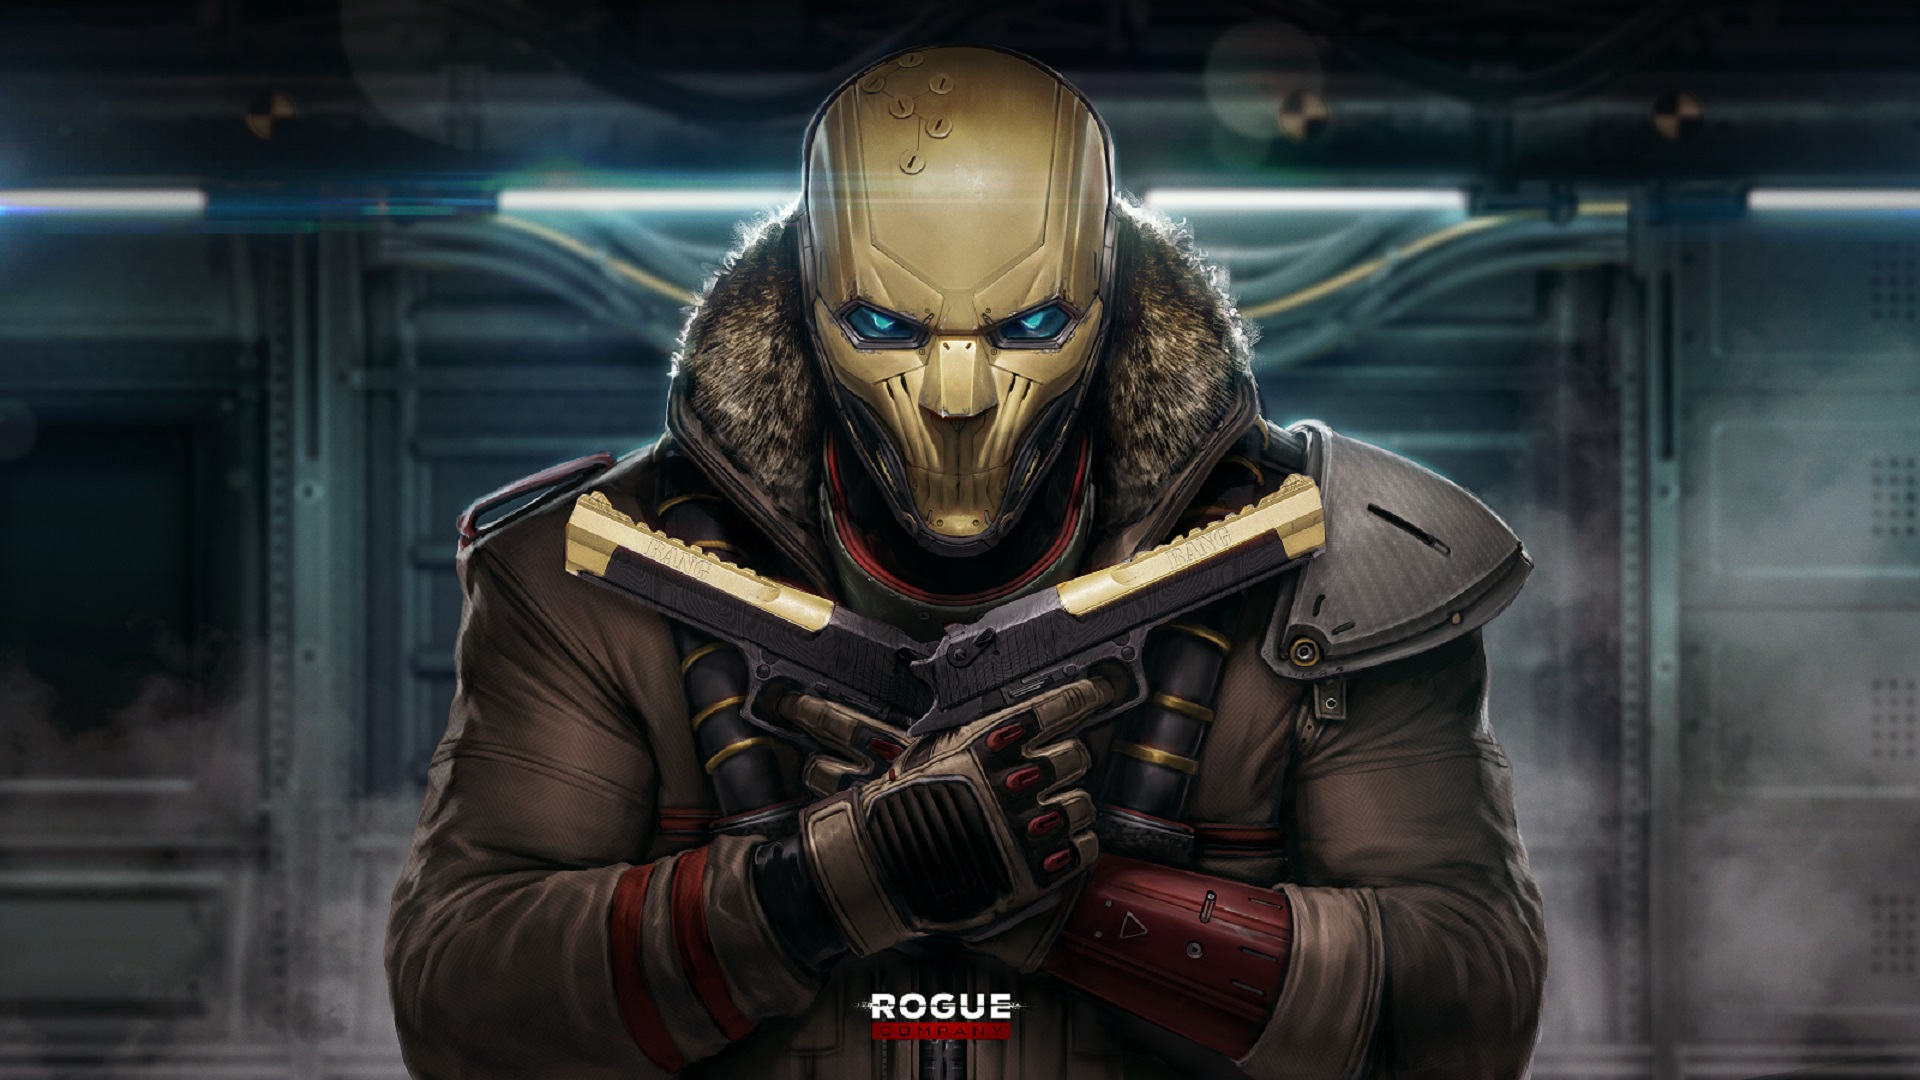 Go Rogue, Because 4's Company